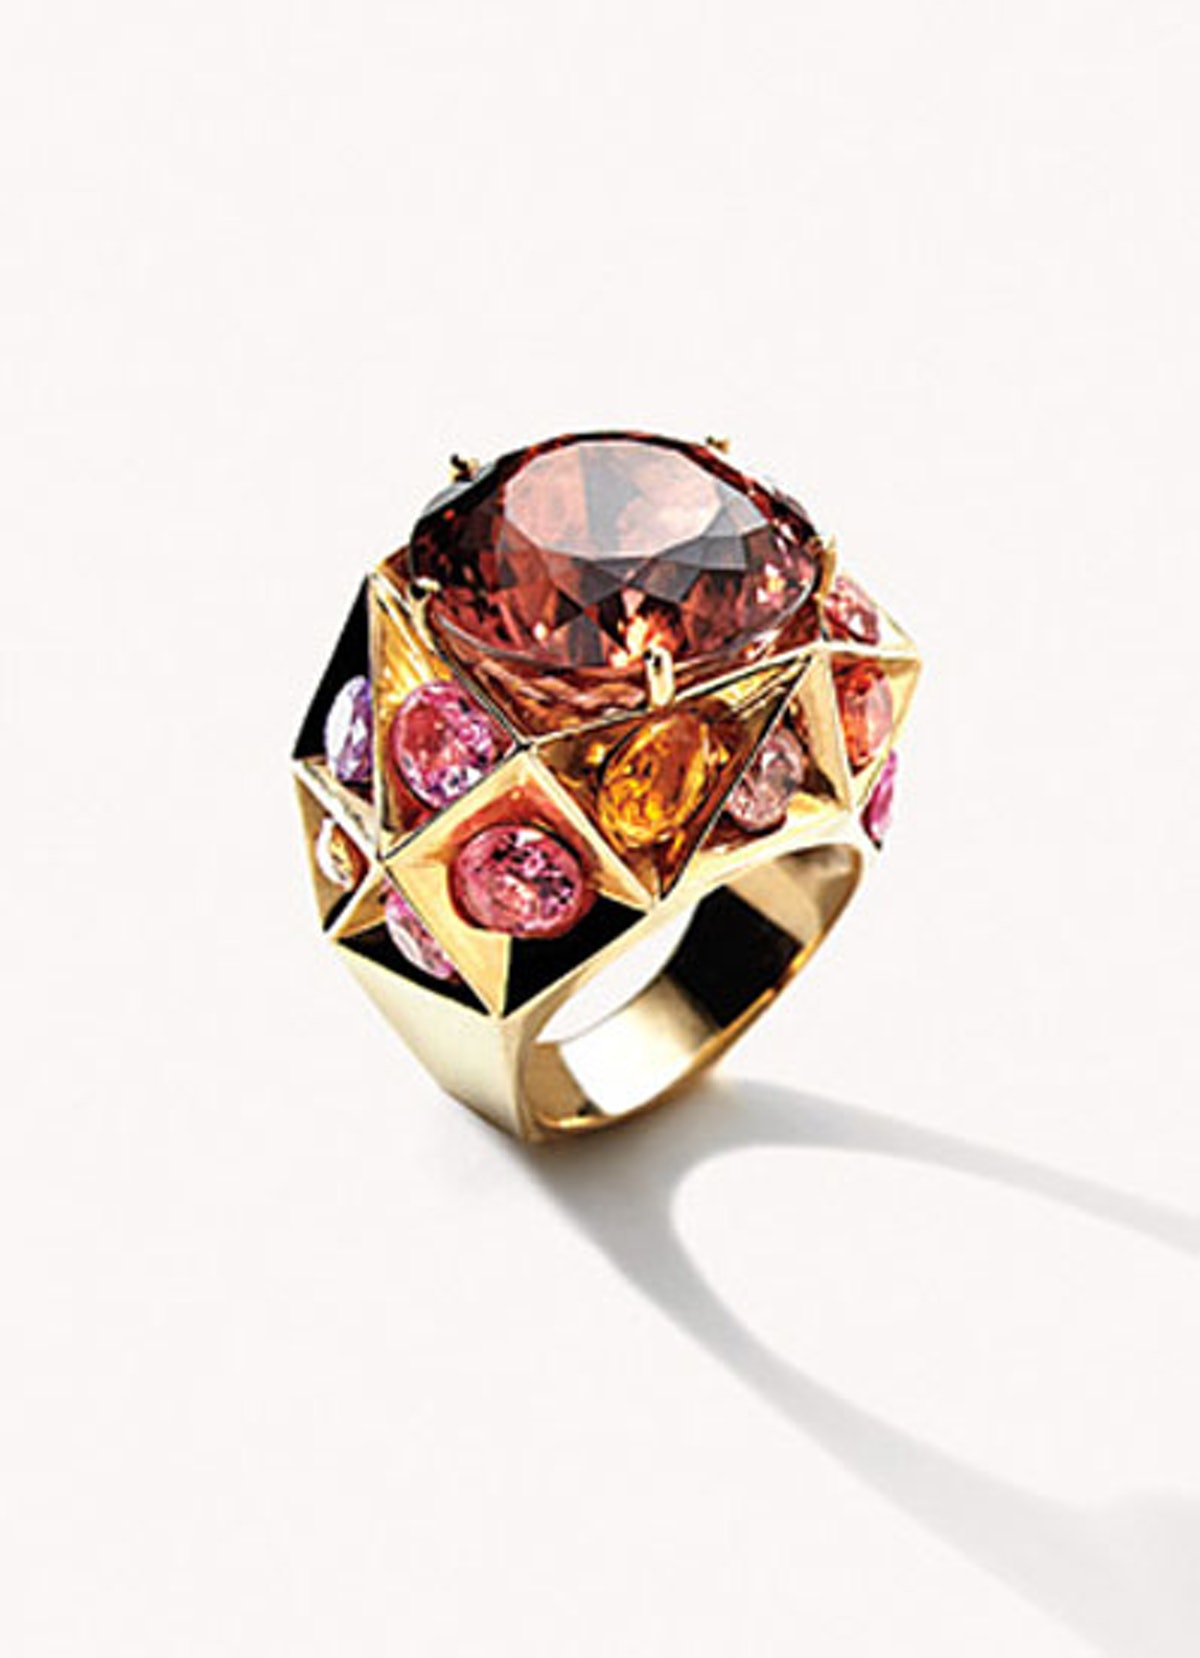 acss-claudia-mata-jewelry-picks-02-v.jpg